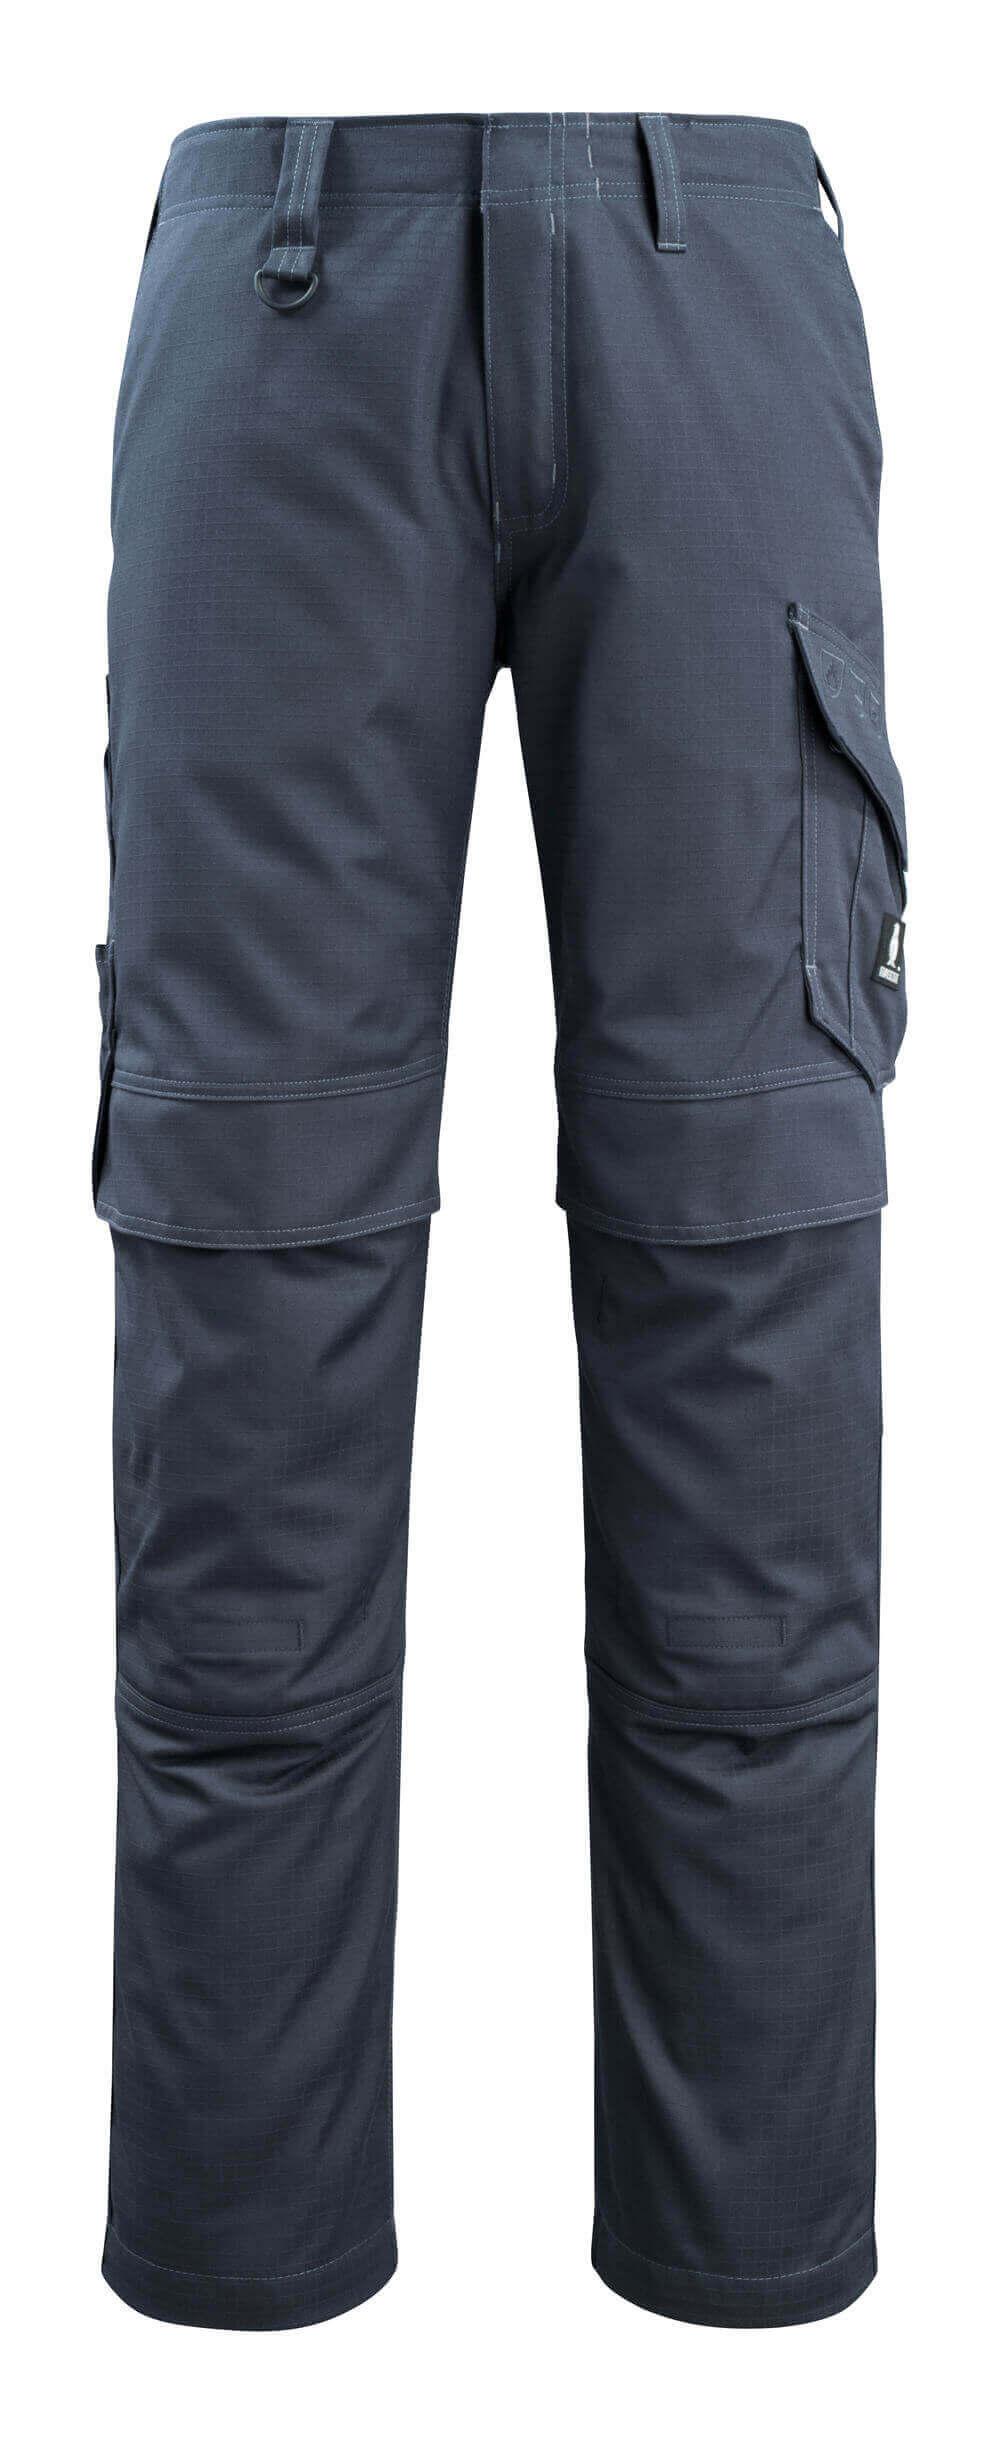 13679-216-010 Pantalon avec poches genouillères - Marine foncé